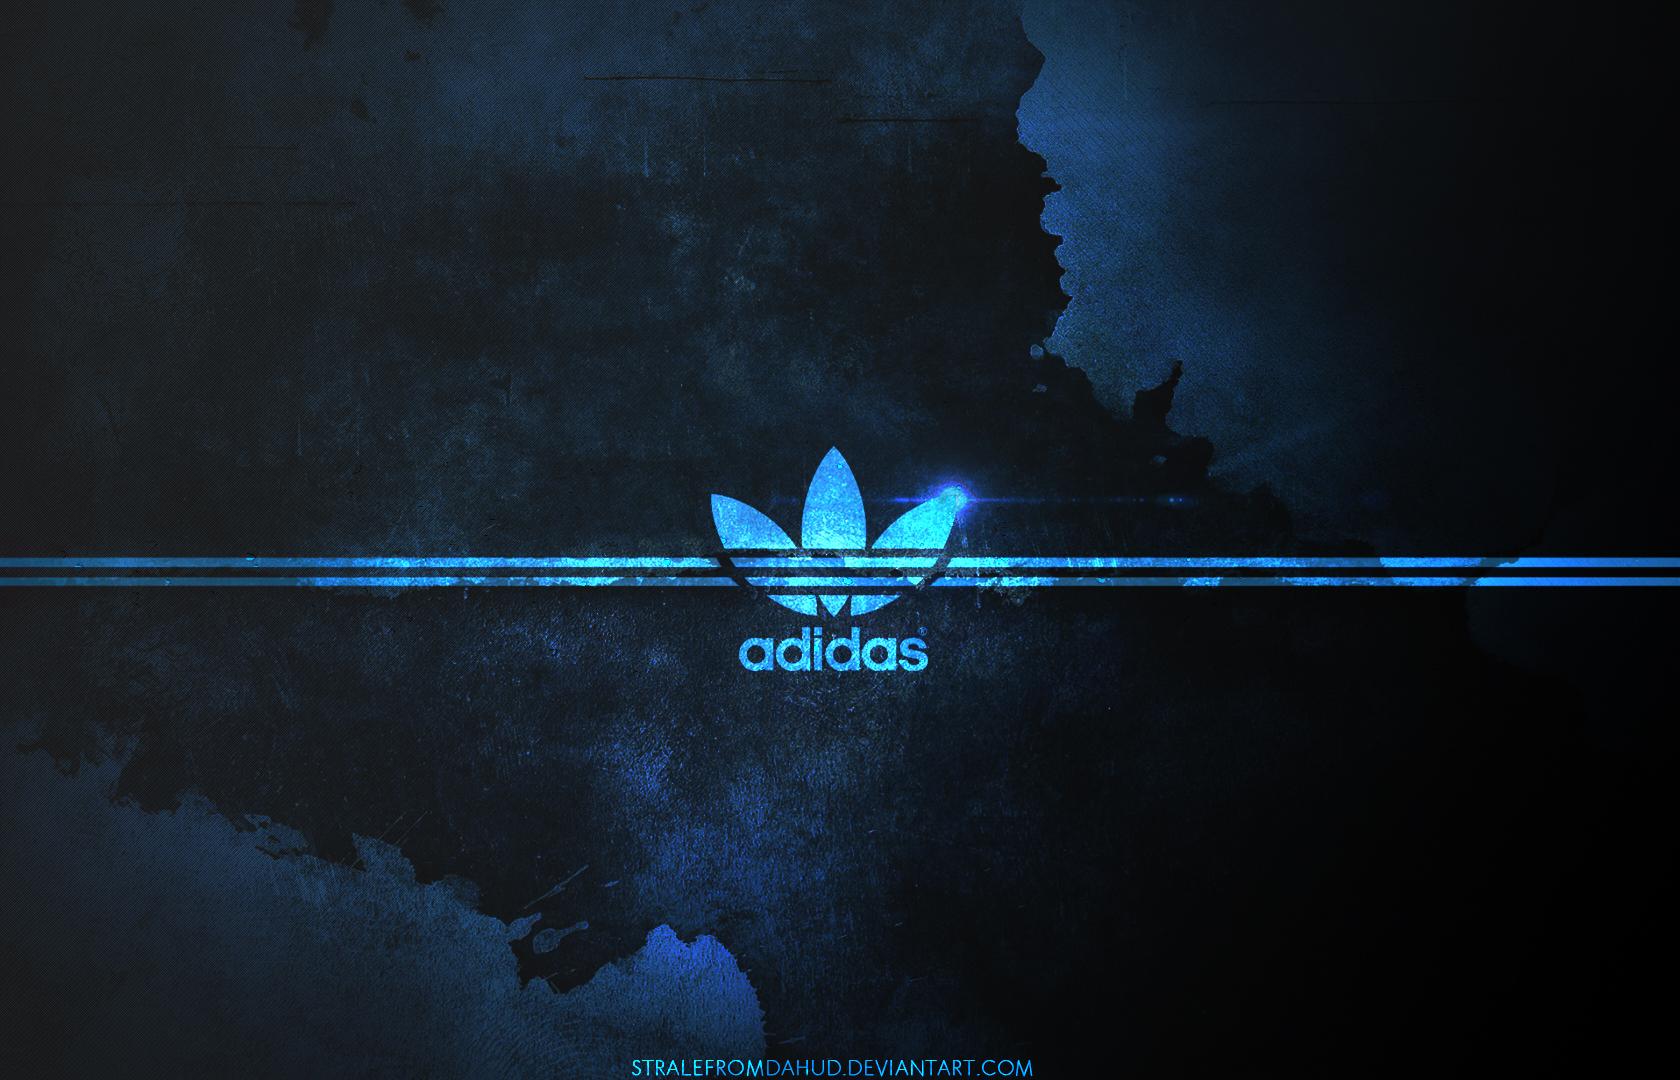 adidas wallpaper by stralefromdahud fan art wallpaper other 2013 2015 1680x1080